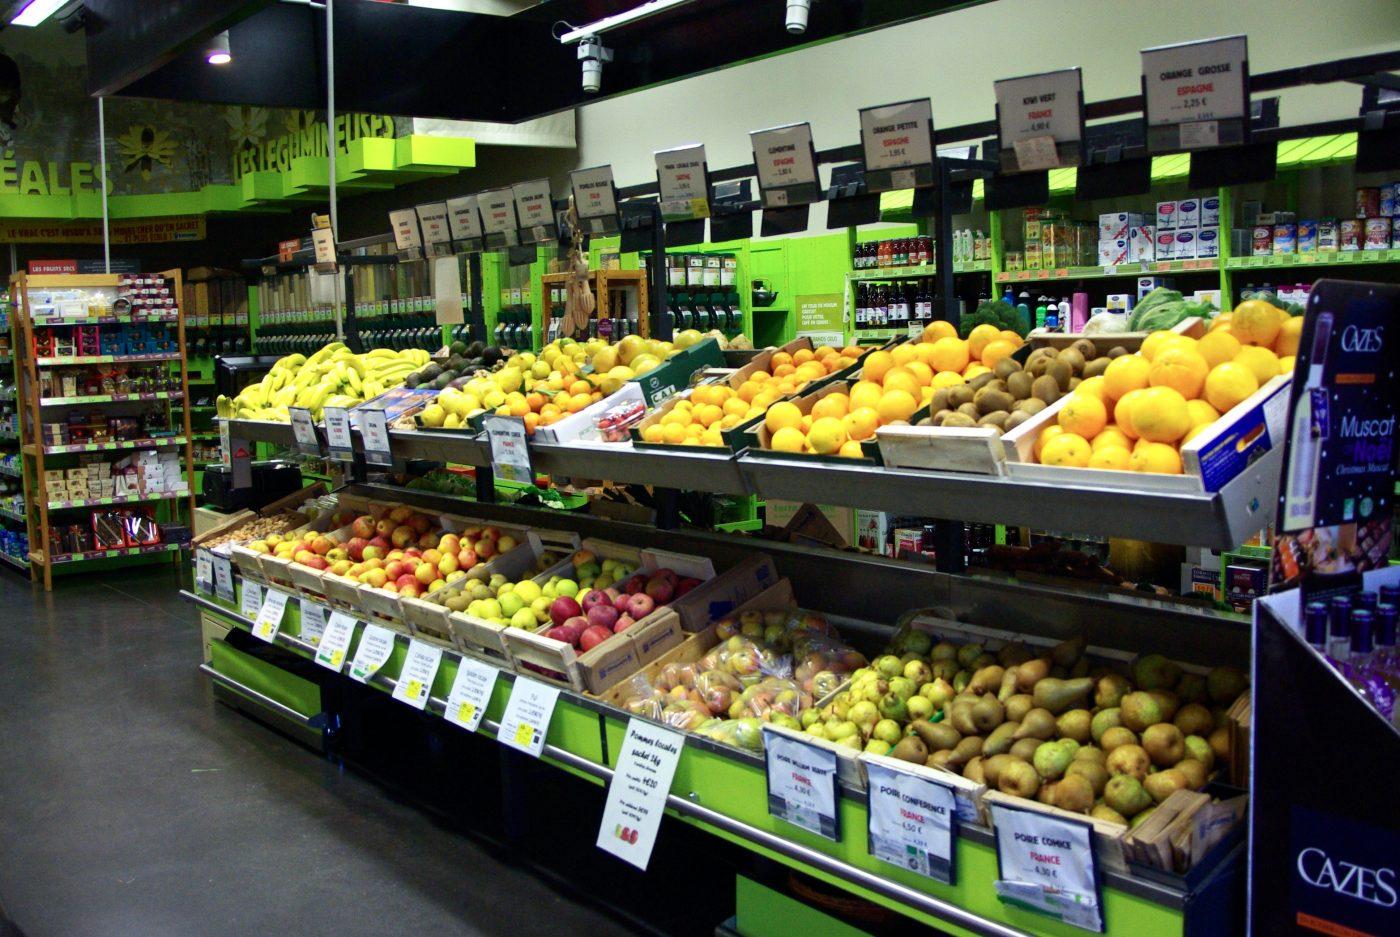 Le Fenouil Biocoop Ruaudin Rayon Fruits Et Legumes 2